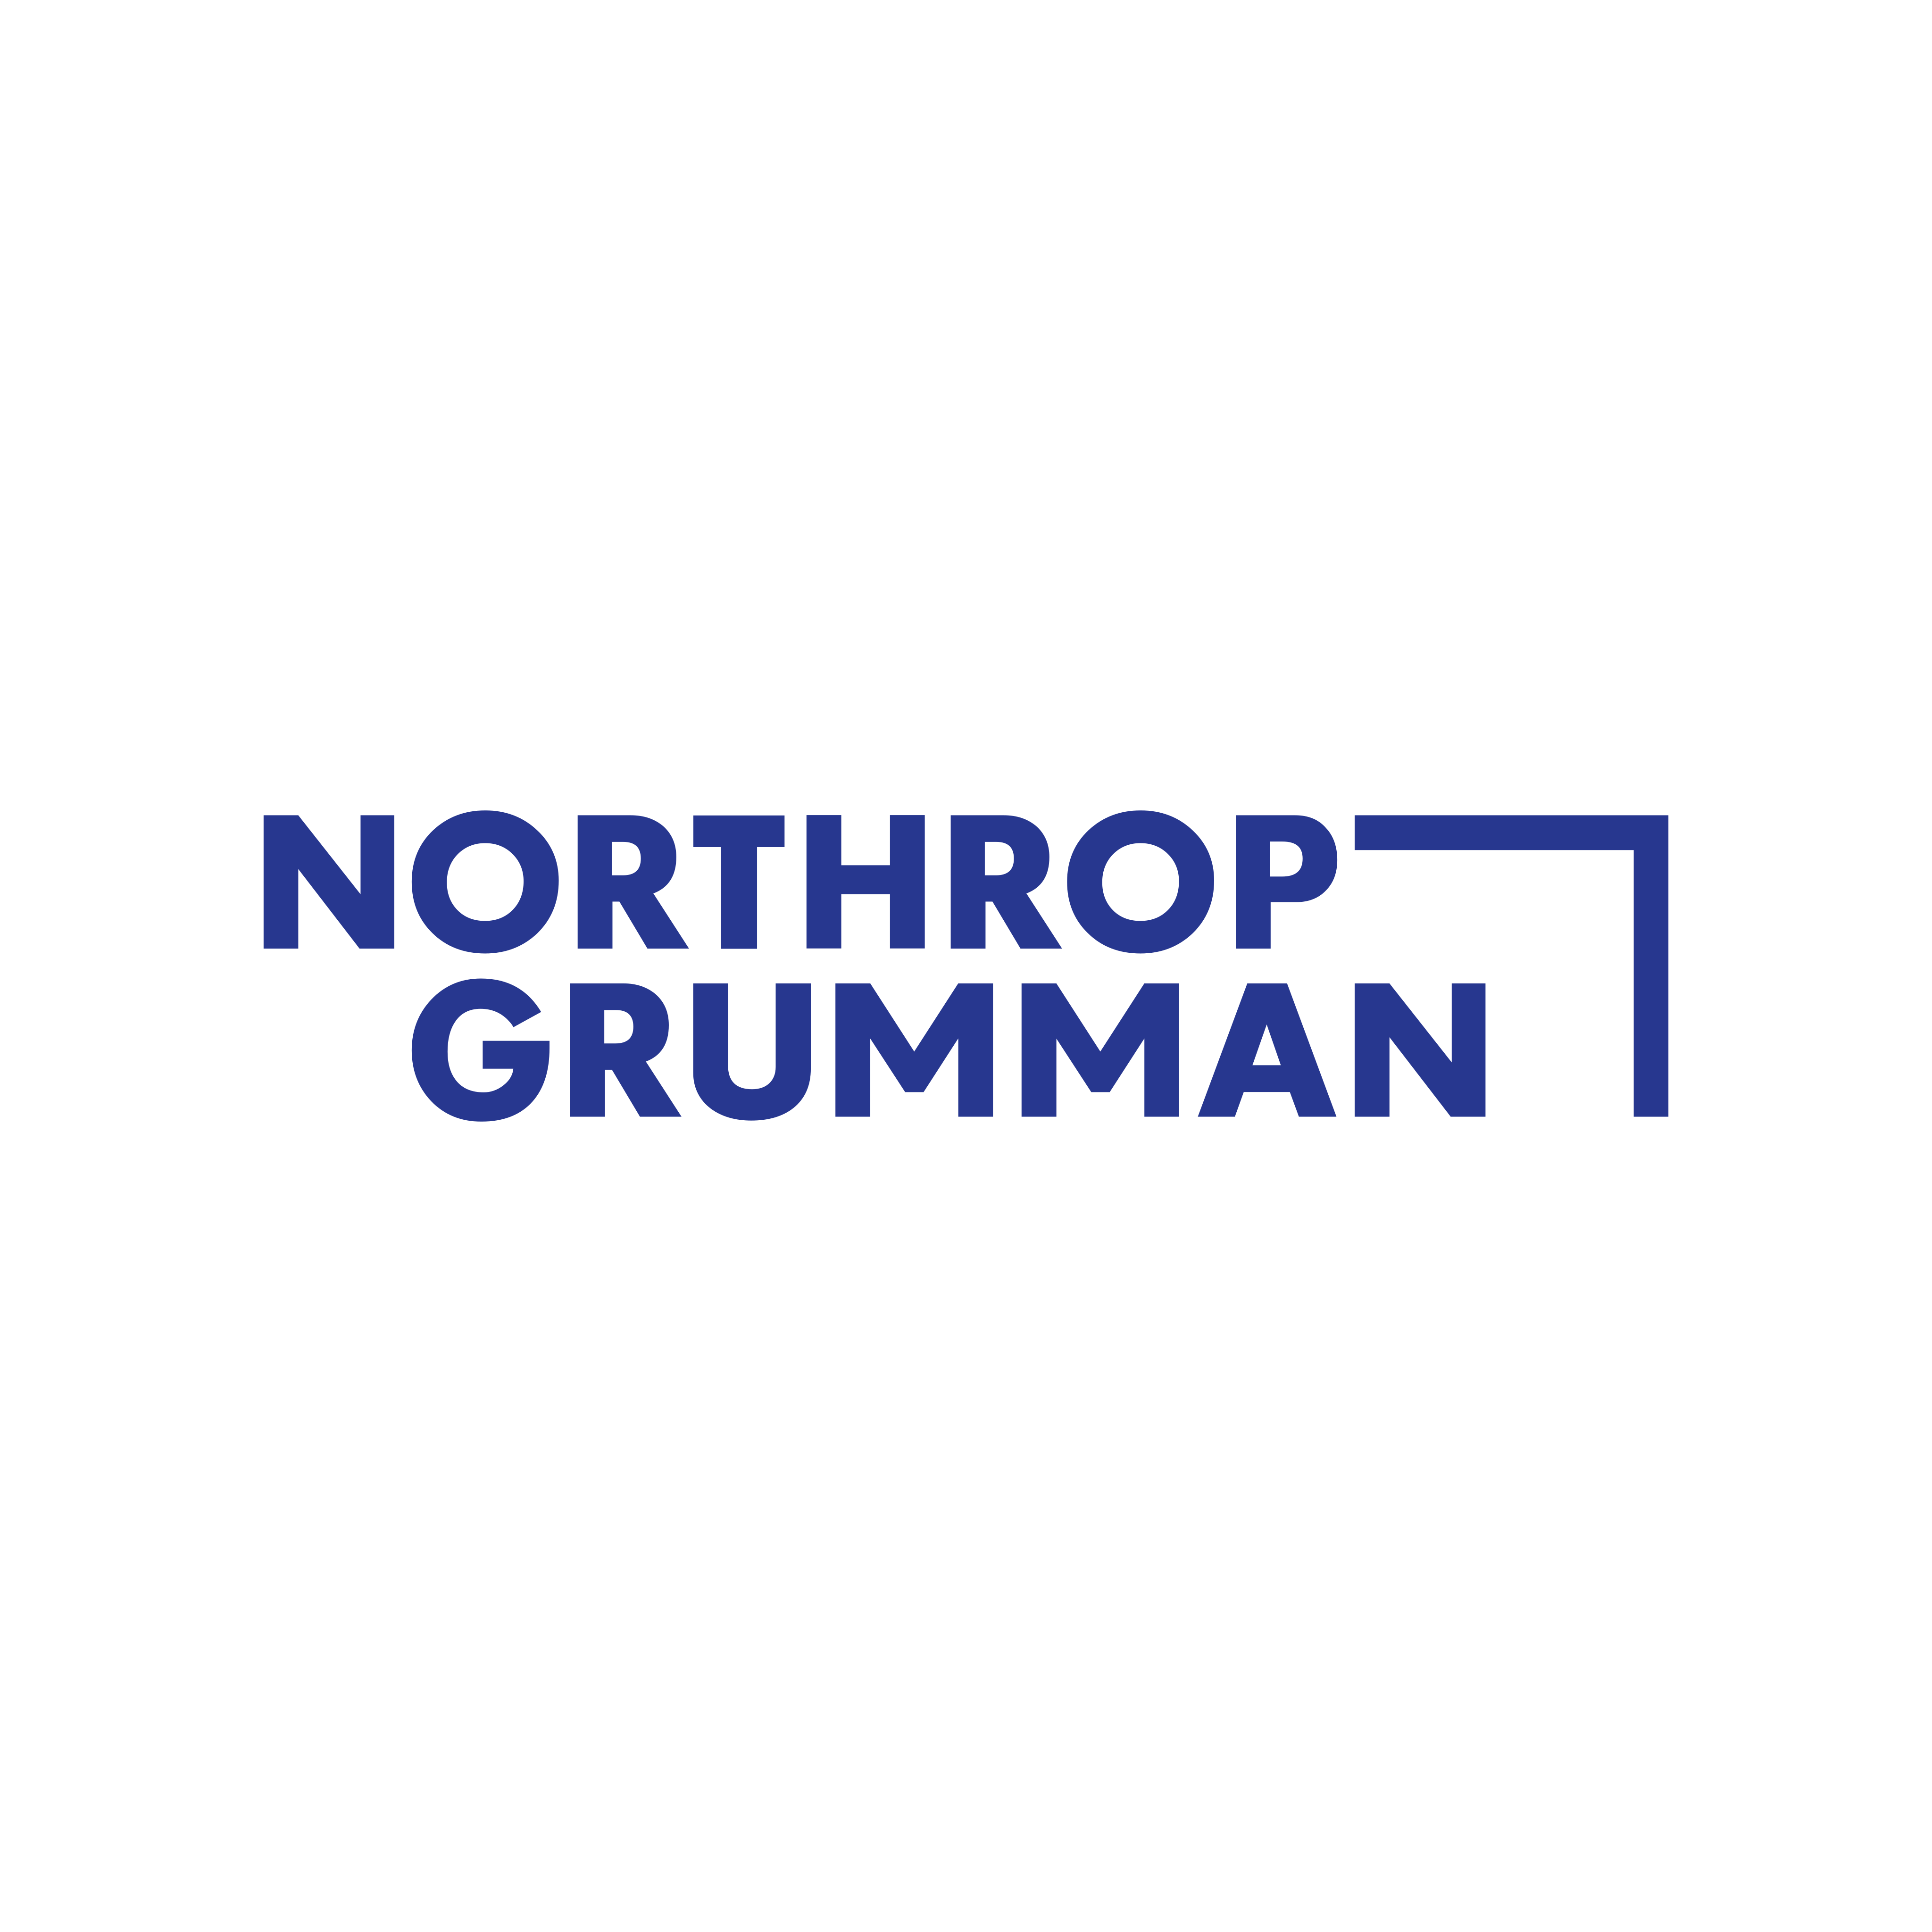 northrop grumman logo 0 - Northrop Grumman Logo